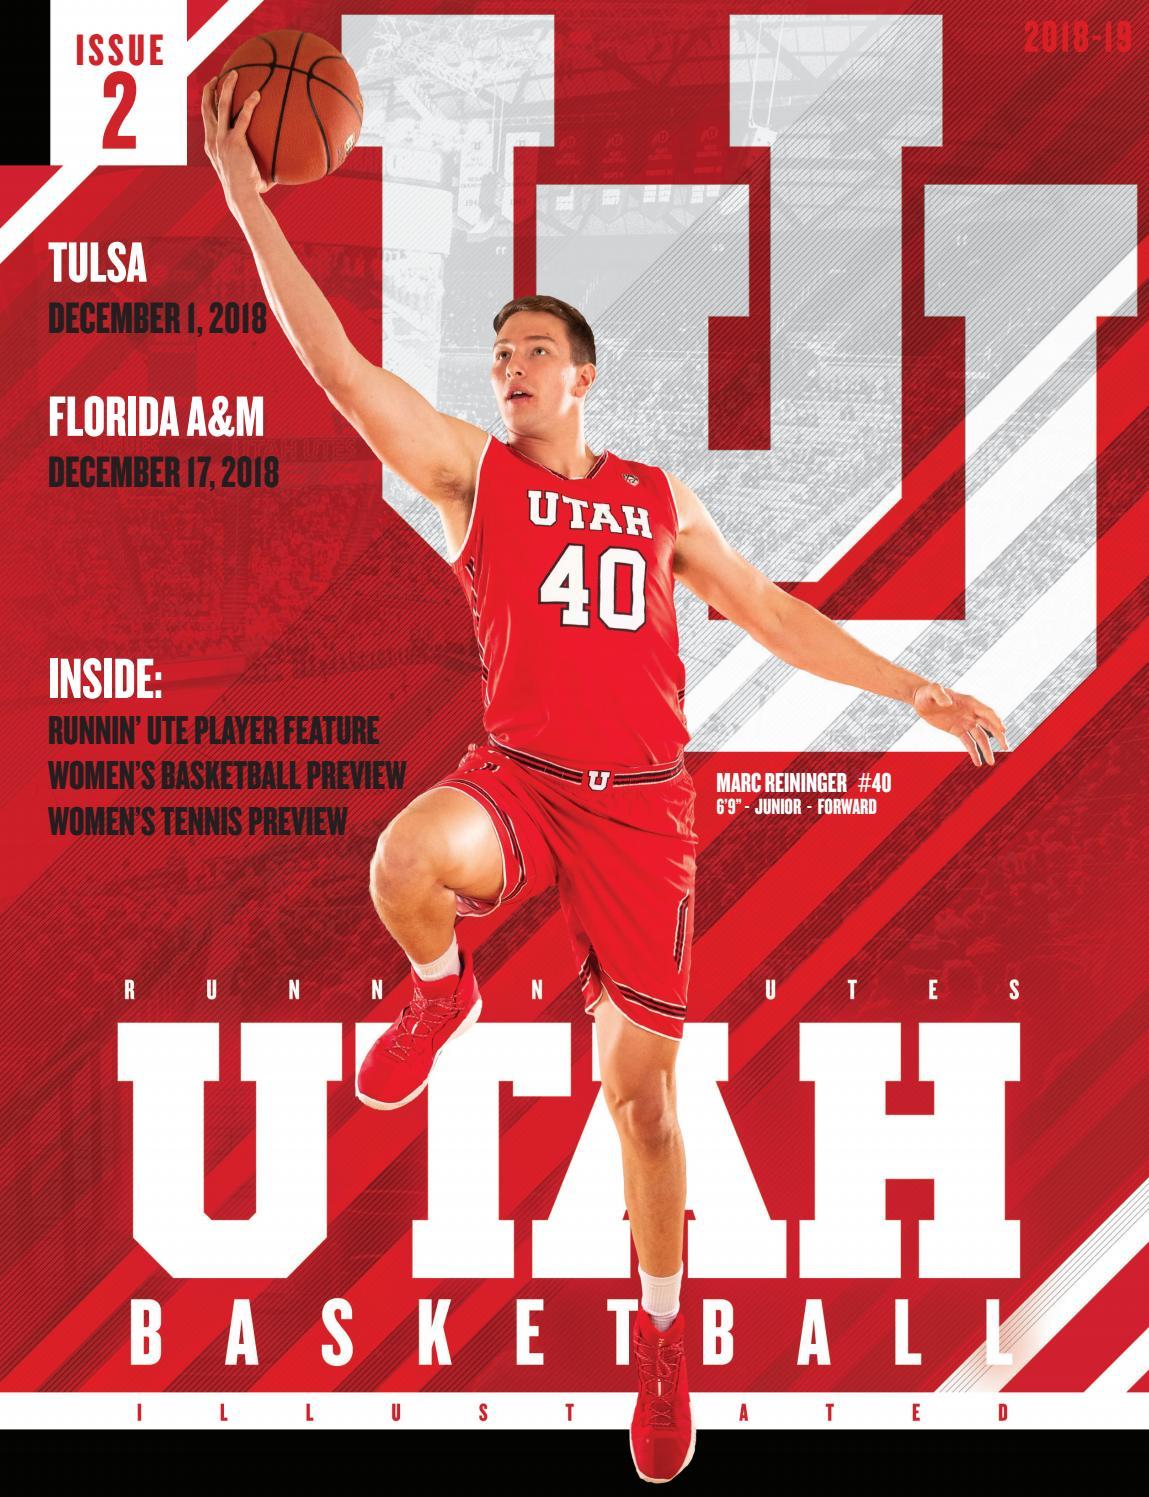 separation shoes 2400e 5c822 Utah Basketball 2018-19 Issue  2